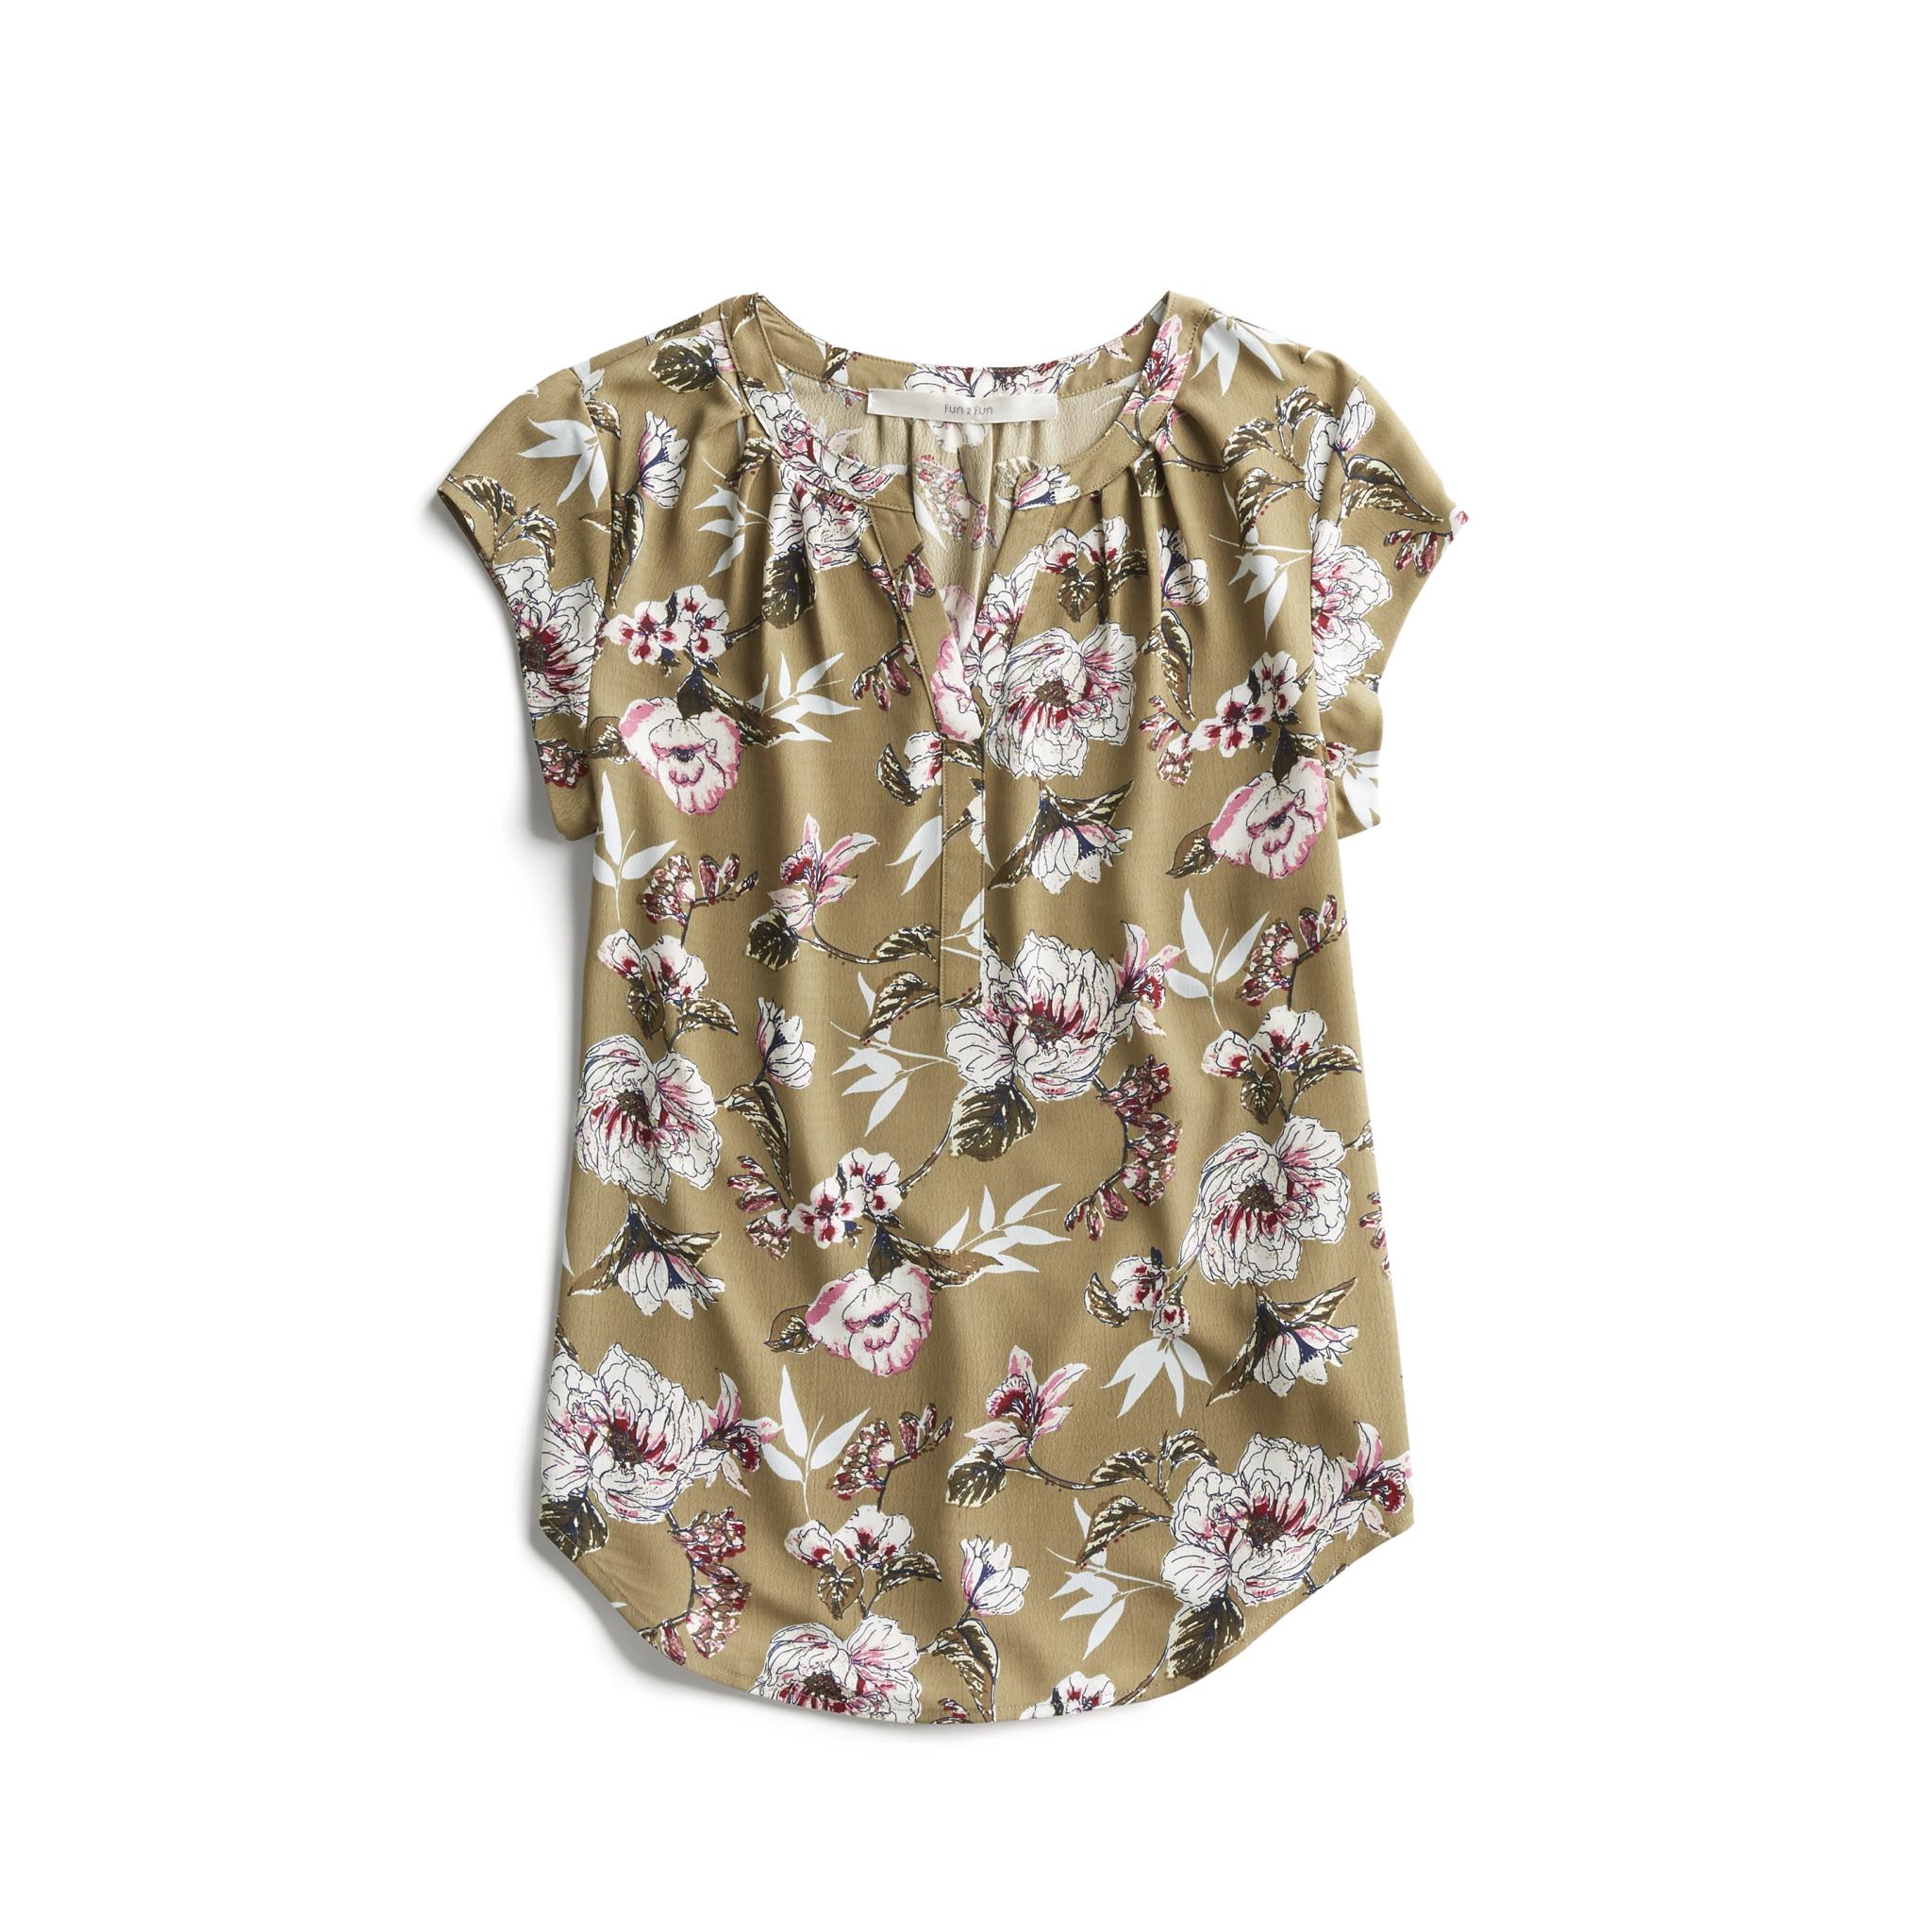 Stitch Fix Spring Stylist Picks Floral Cap Sleeve Blouse